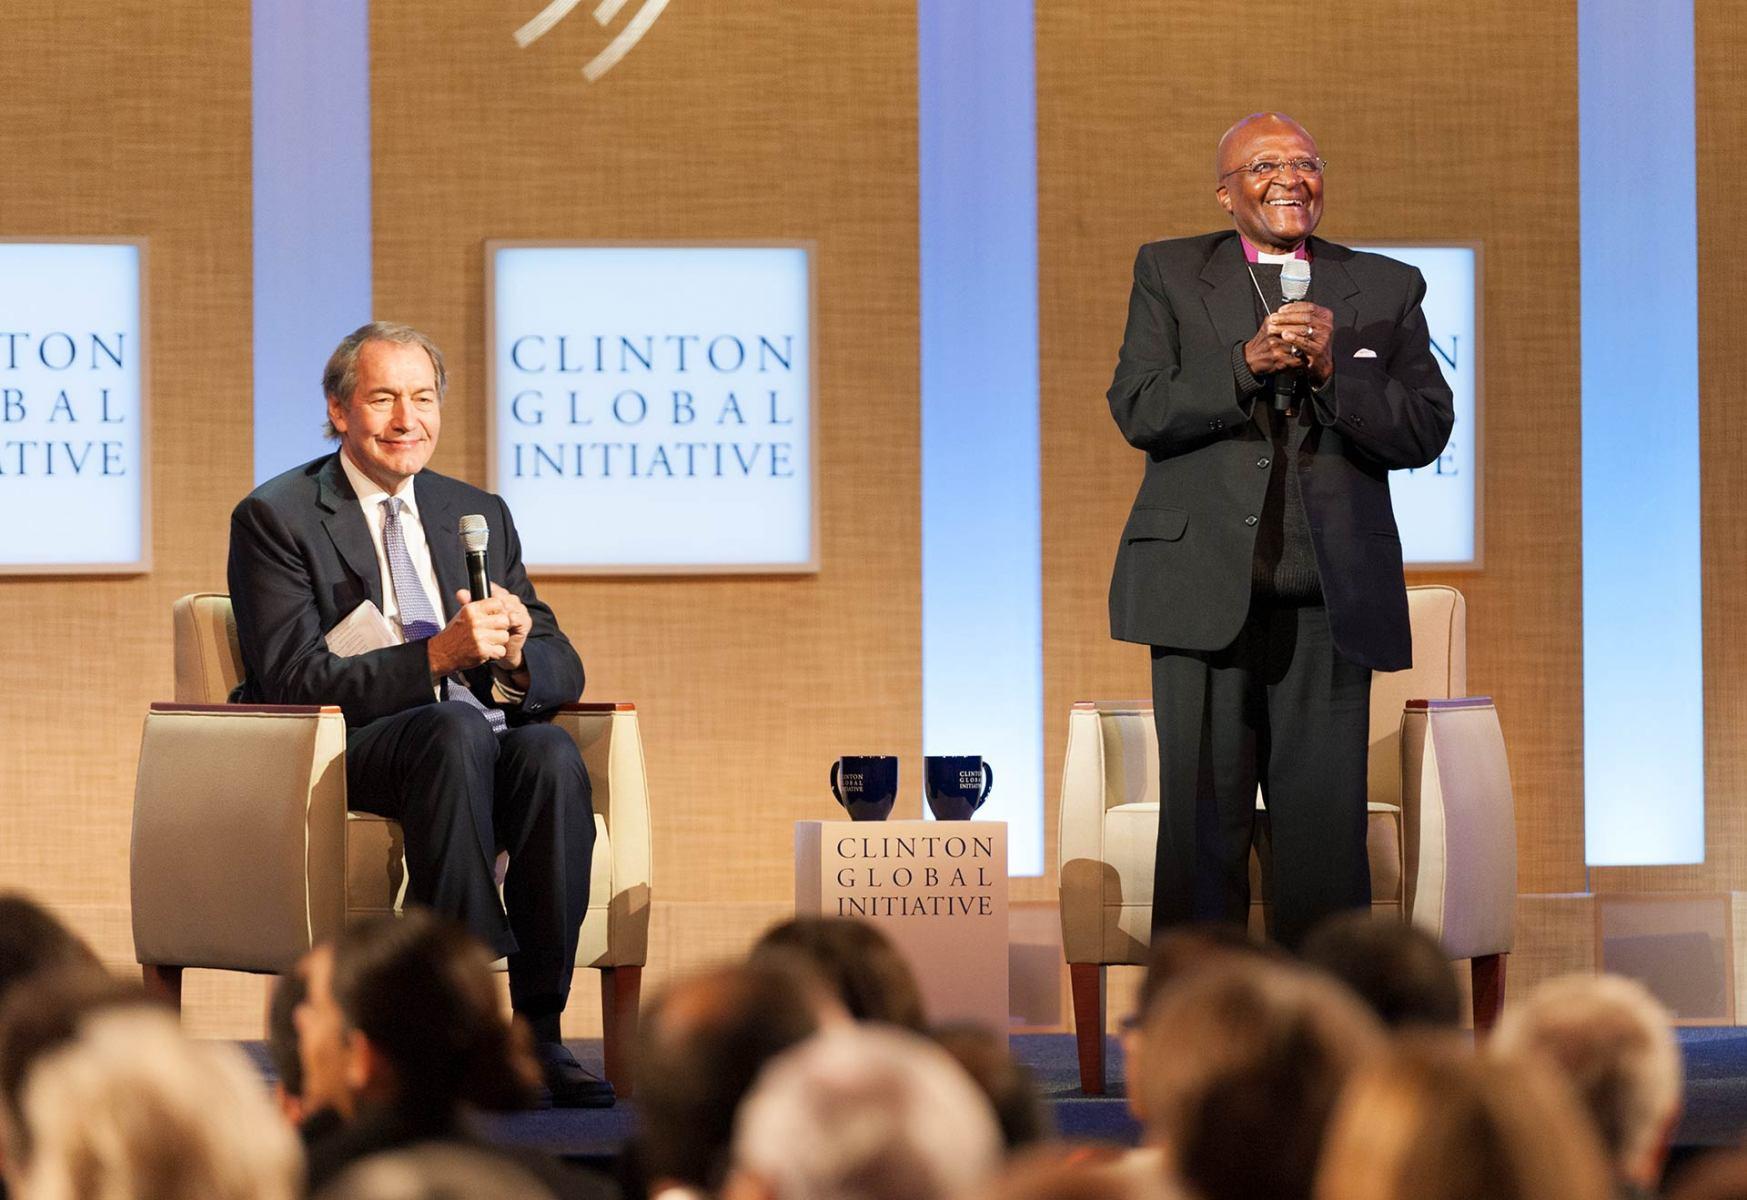 Clinton Global Initiative 2011; Conversations on Courage - Humanitarian Leadership in Action; Charlie Rose; Archbishop Desmond M. Tutu; Aung San Suu Ky; 09-210-201